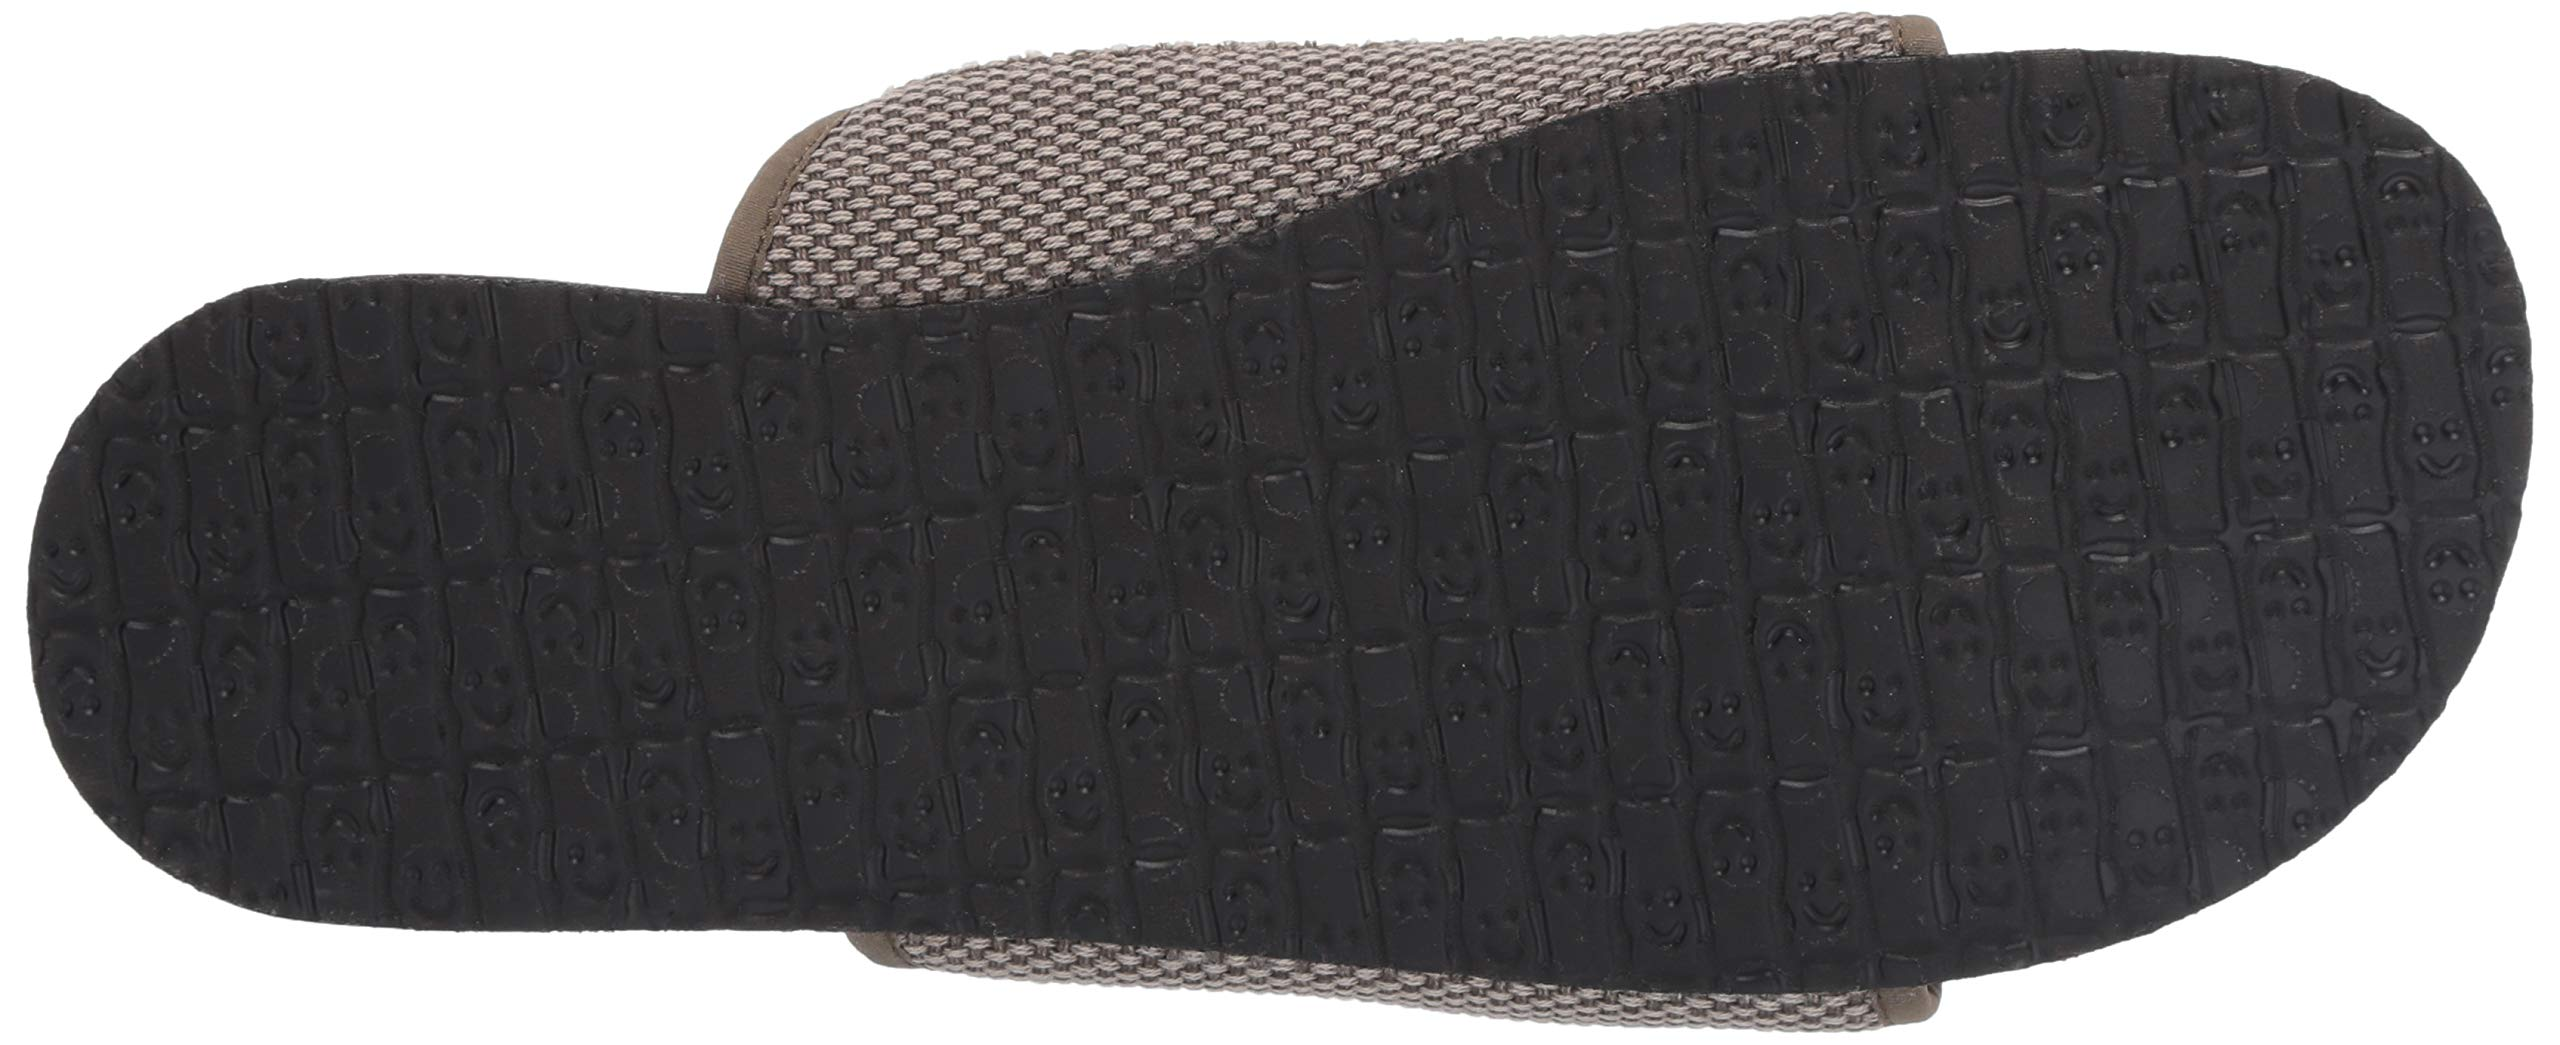 Sanuk-Men-039-s-Beer-Cozy-2-Slide-Sandal-Choose-SZ-color thumbnail 13